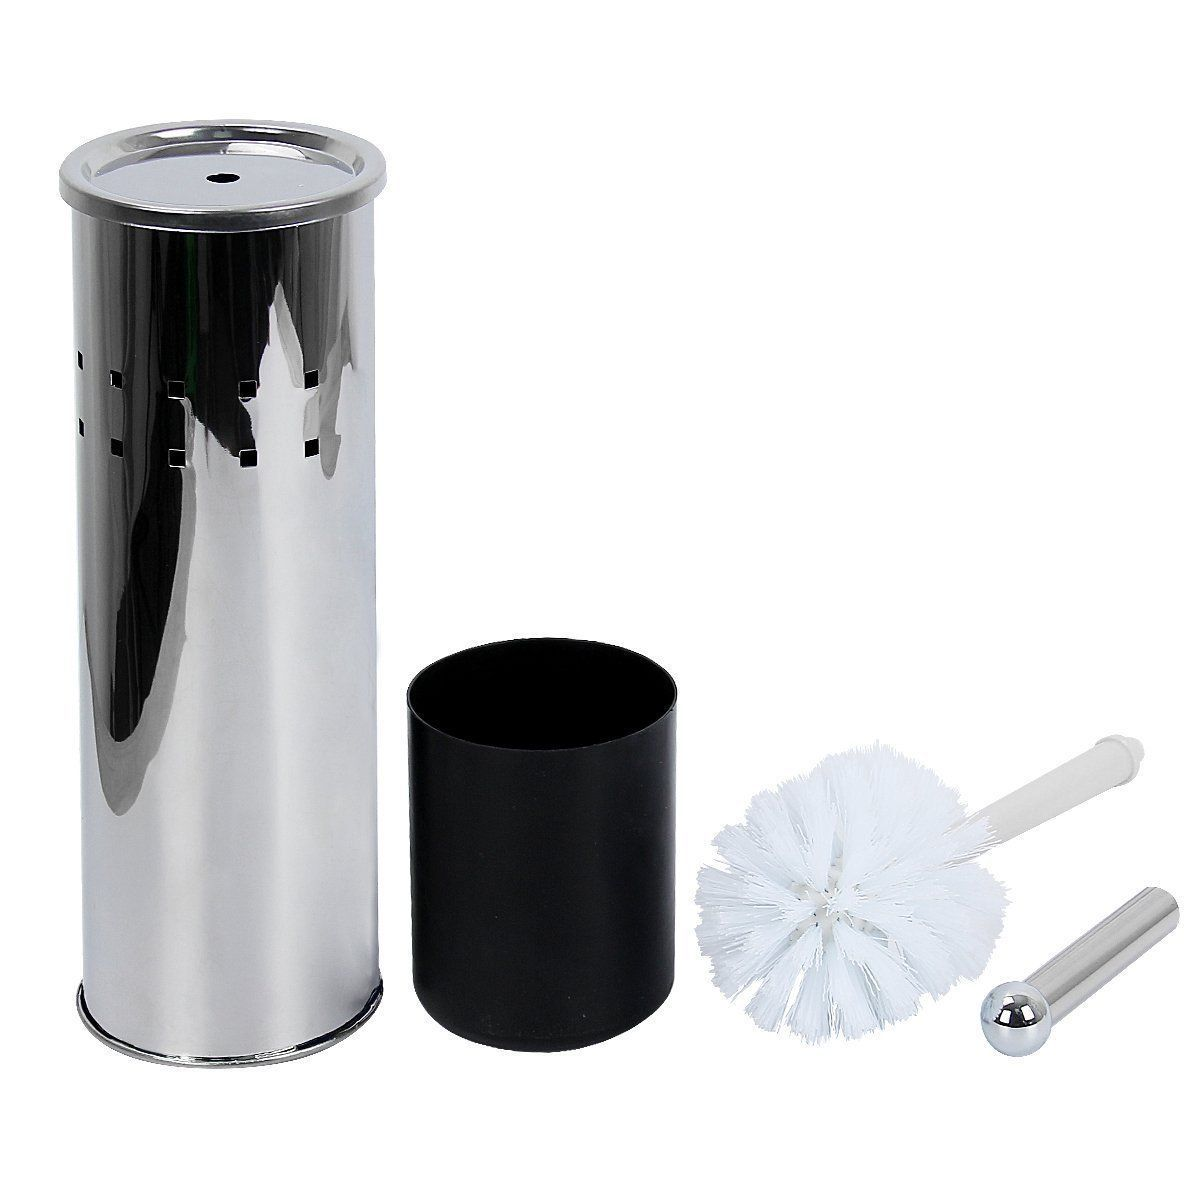 Toilet Brush Holder Bathroom Wc Lavatory Stainless Steel Vented ...